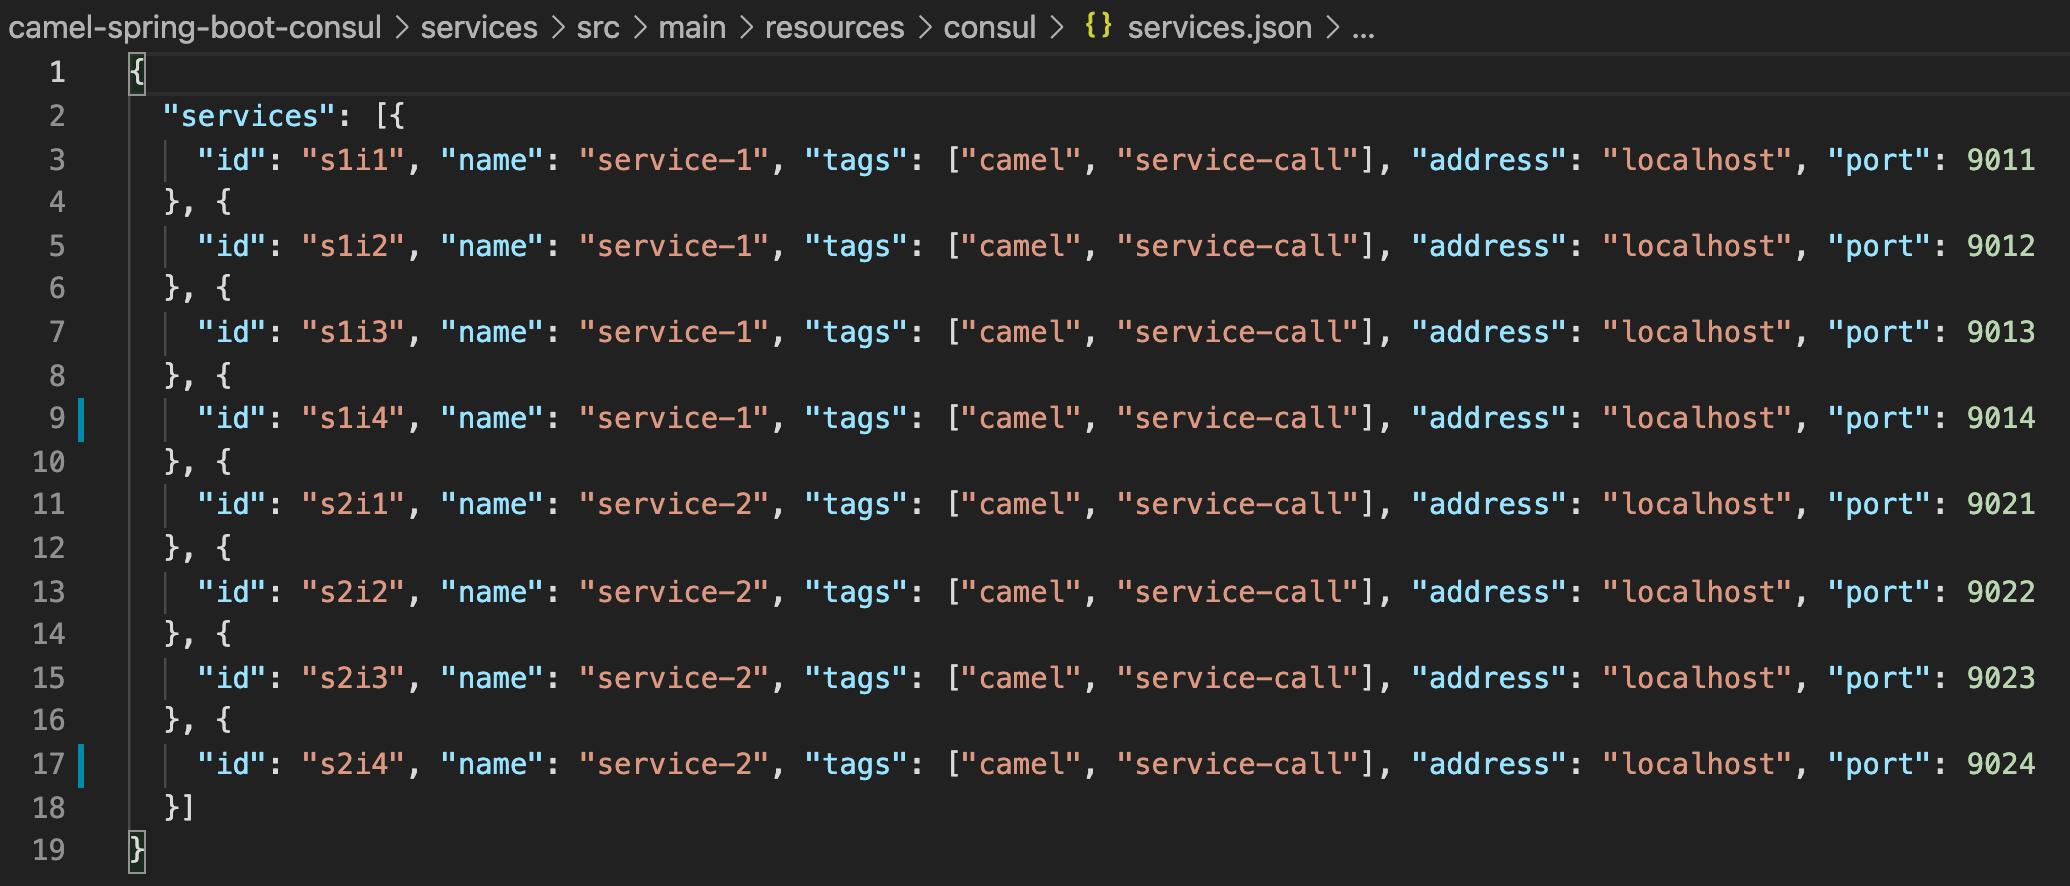 Consul services.json file